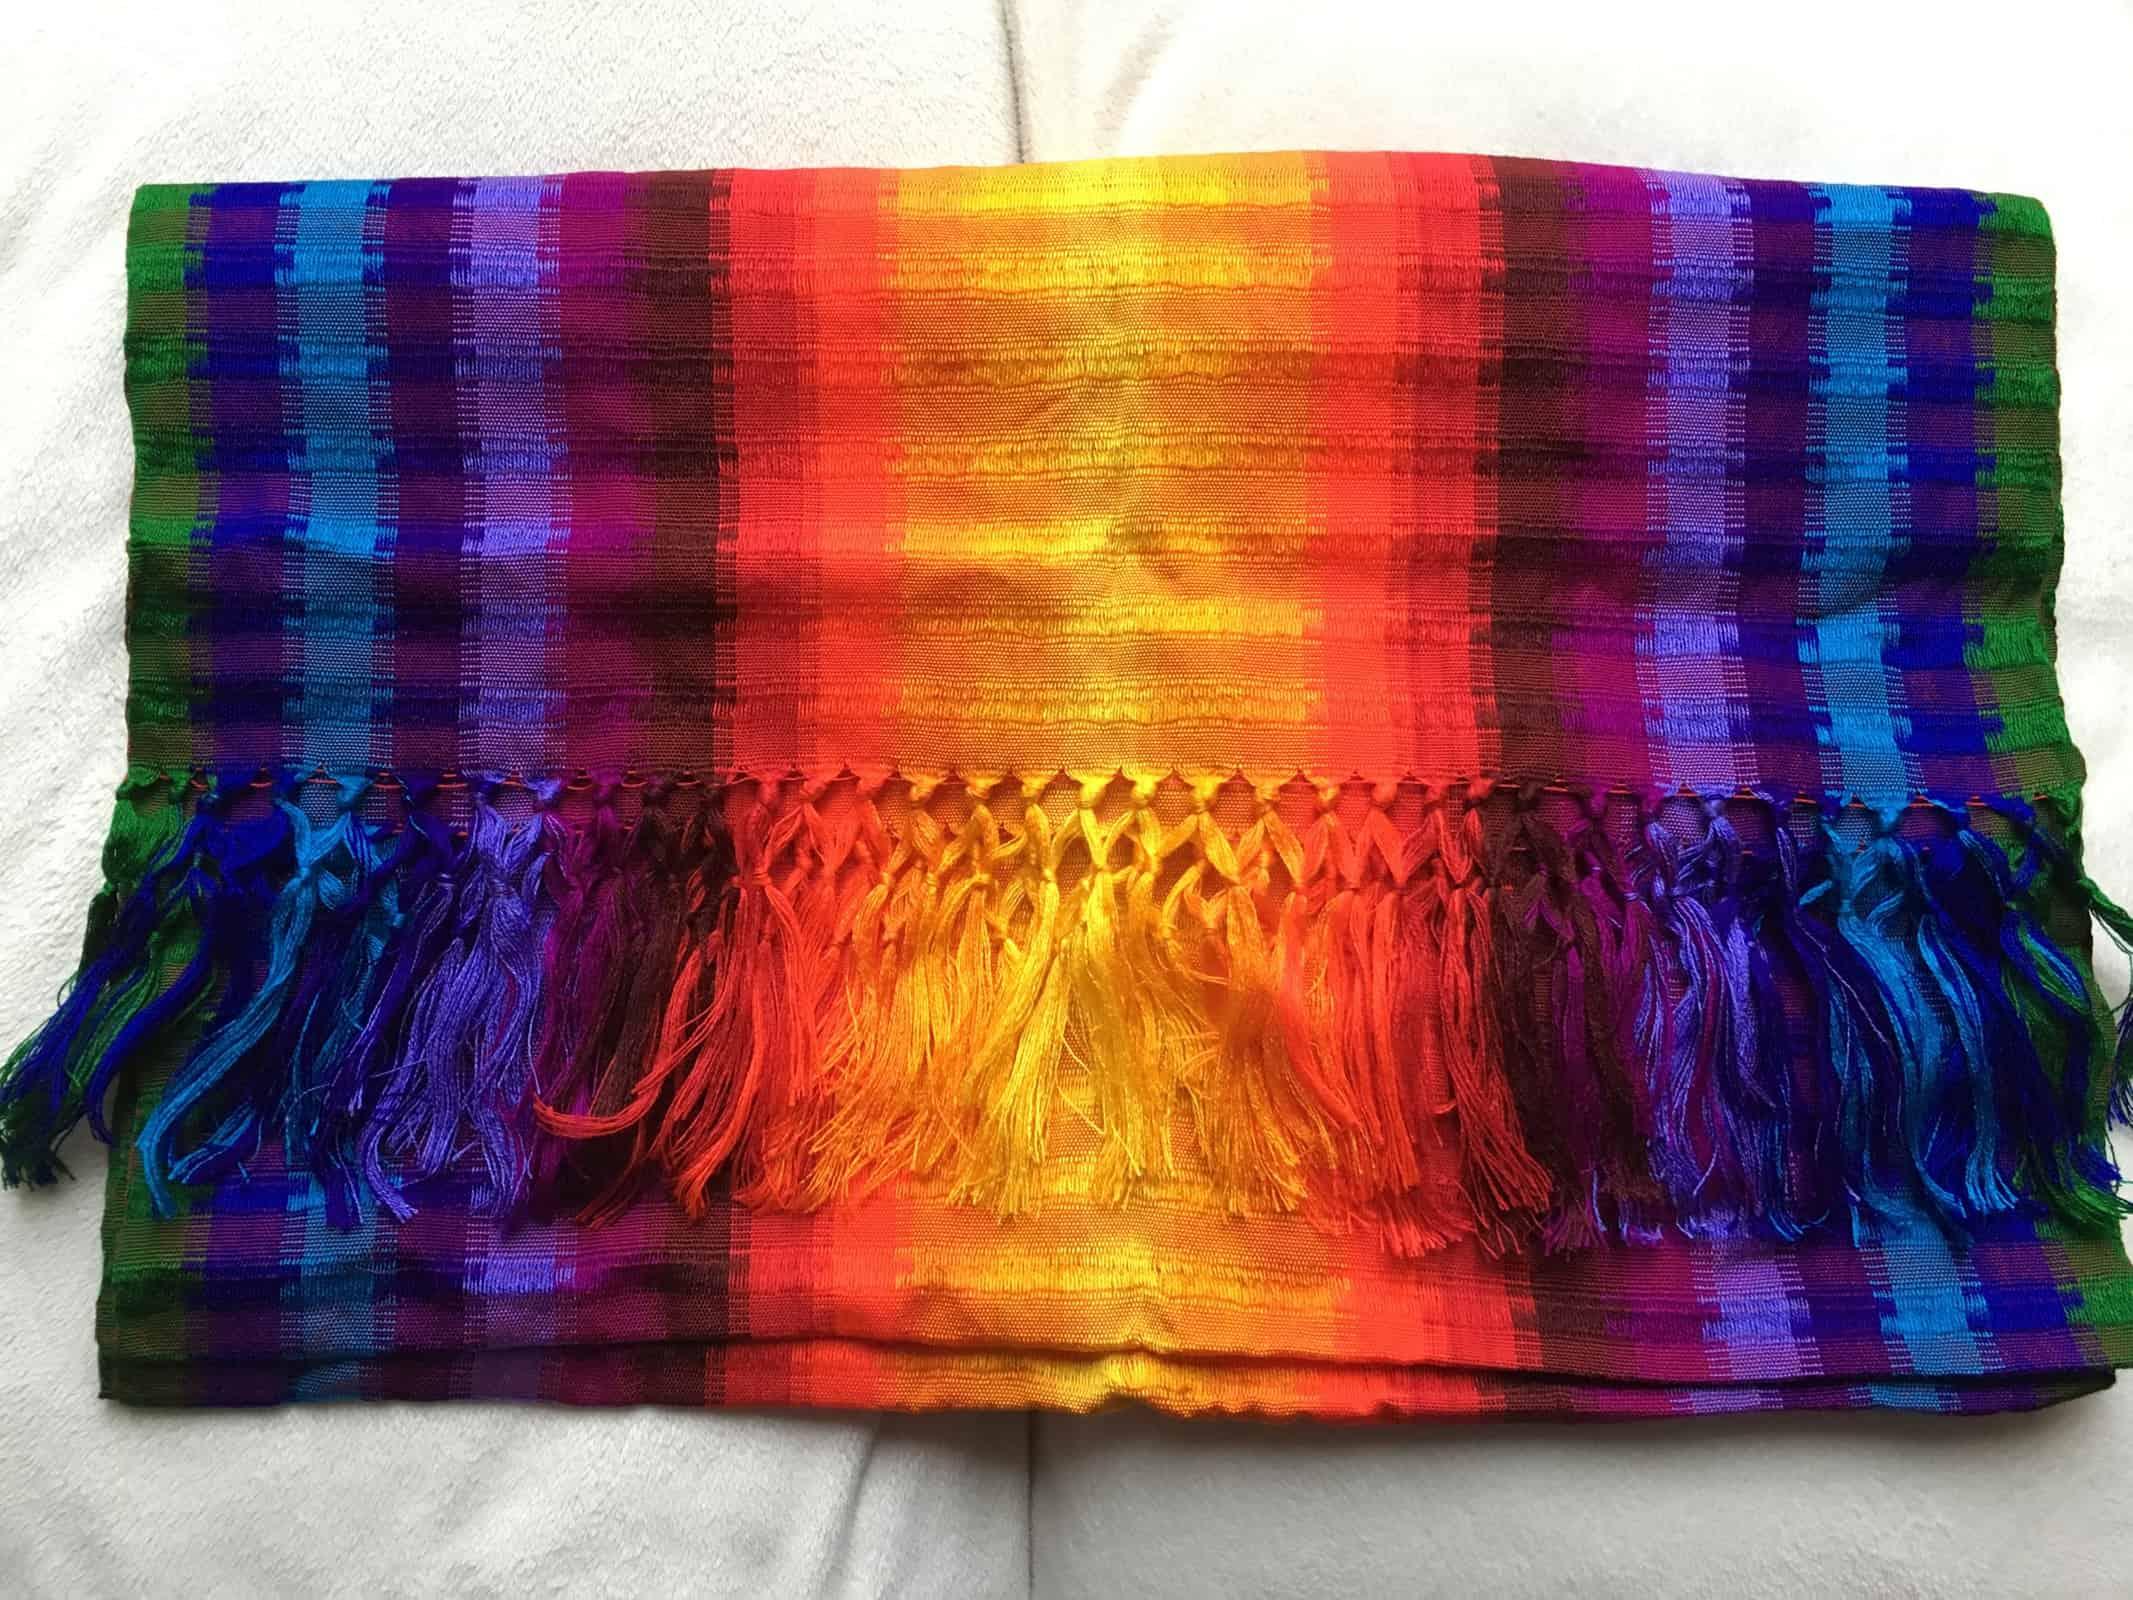 Rainbow rebozo from Guatemala